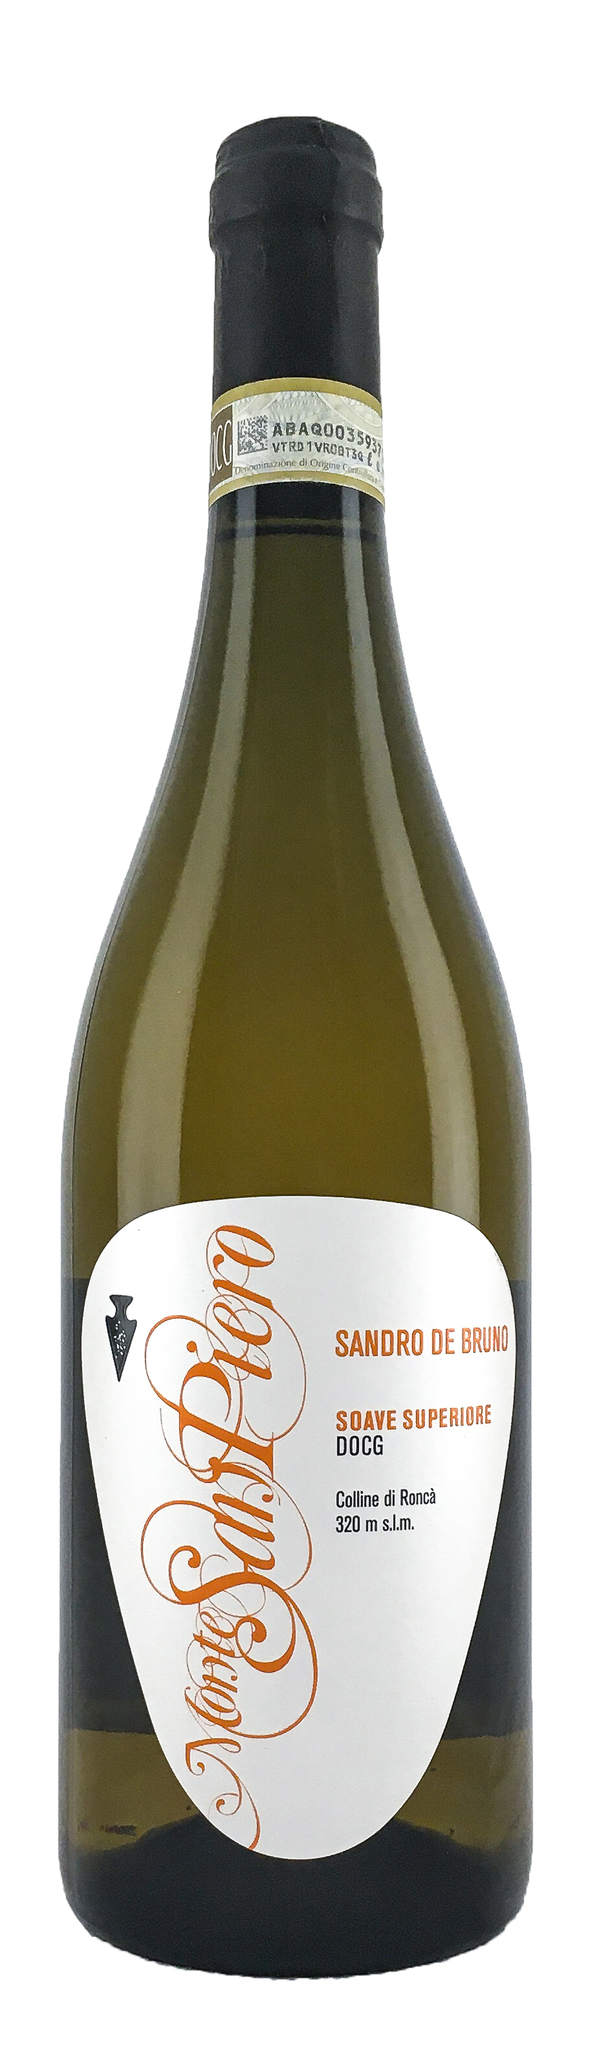 Вино Монте Сен Пьеро Соаве Супероире сухое белое, з.н.м.п. категория DOCG, регион Венето 0,75л.